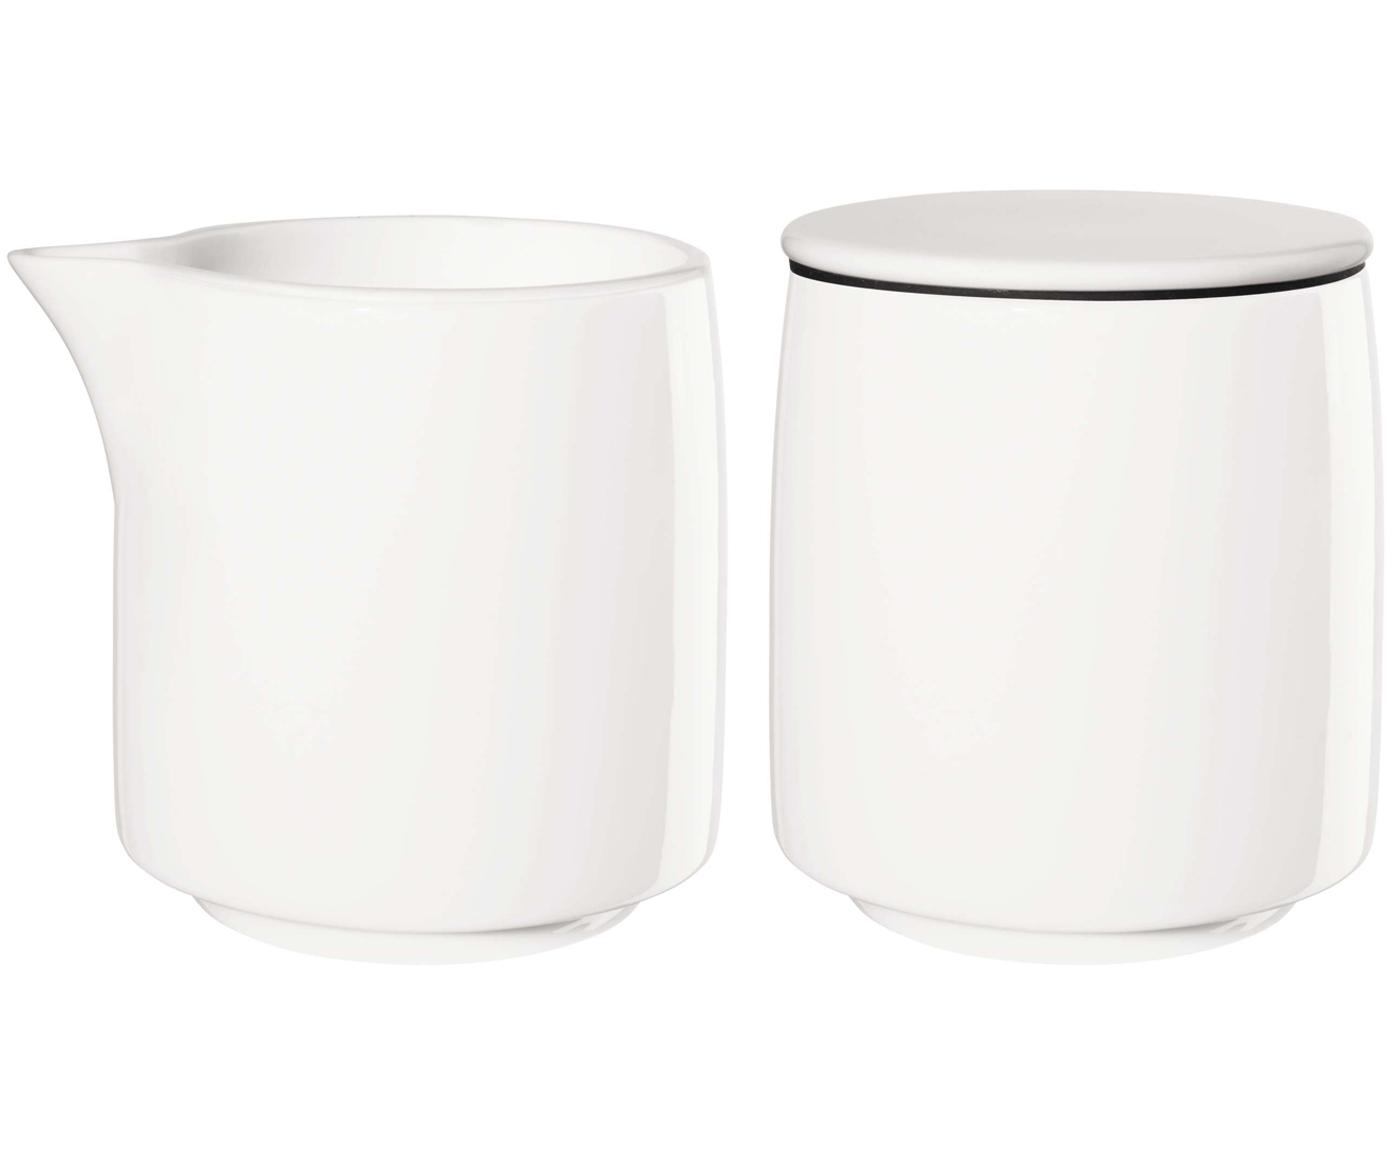 Set de lechera y azucarero Safe, 2pzas., Porcelana, Blanco, negro, Ø 8 x Al 8 cm